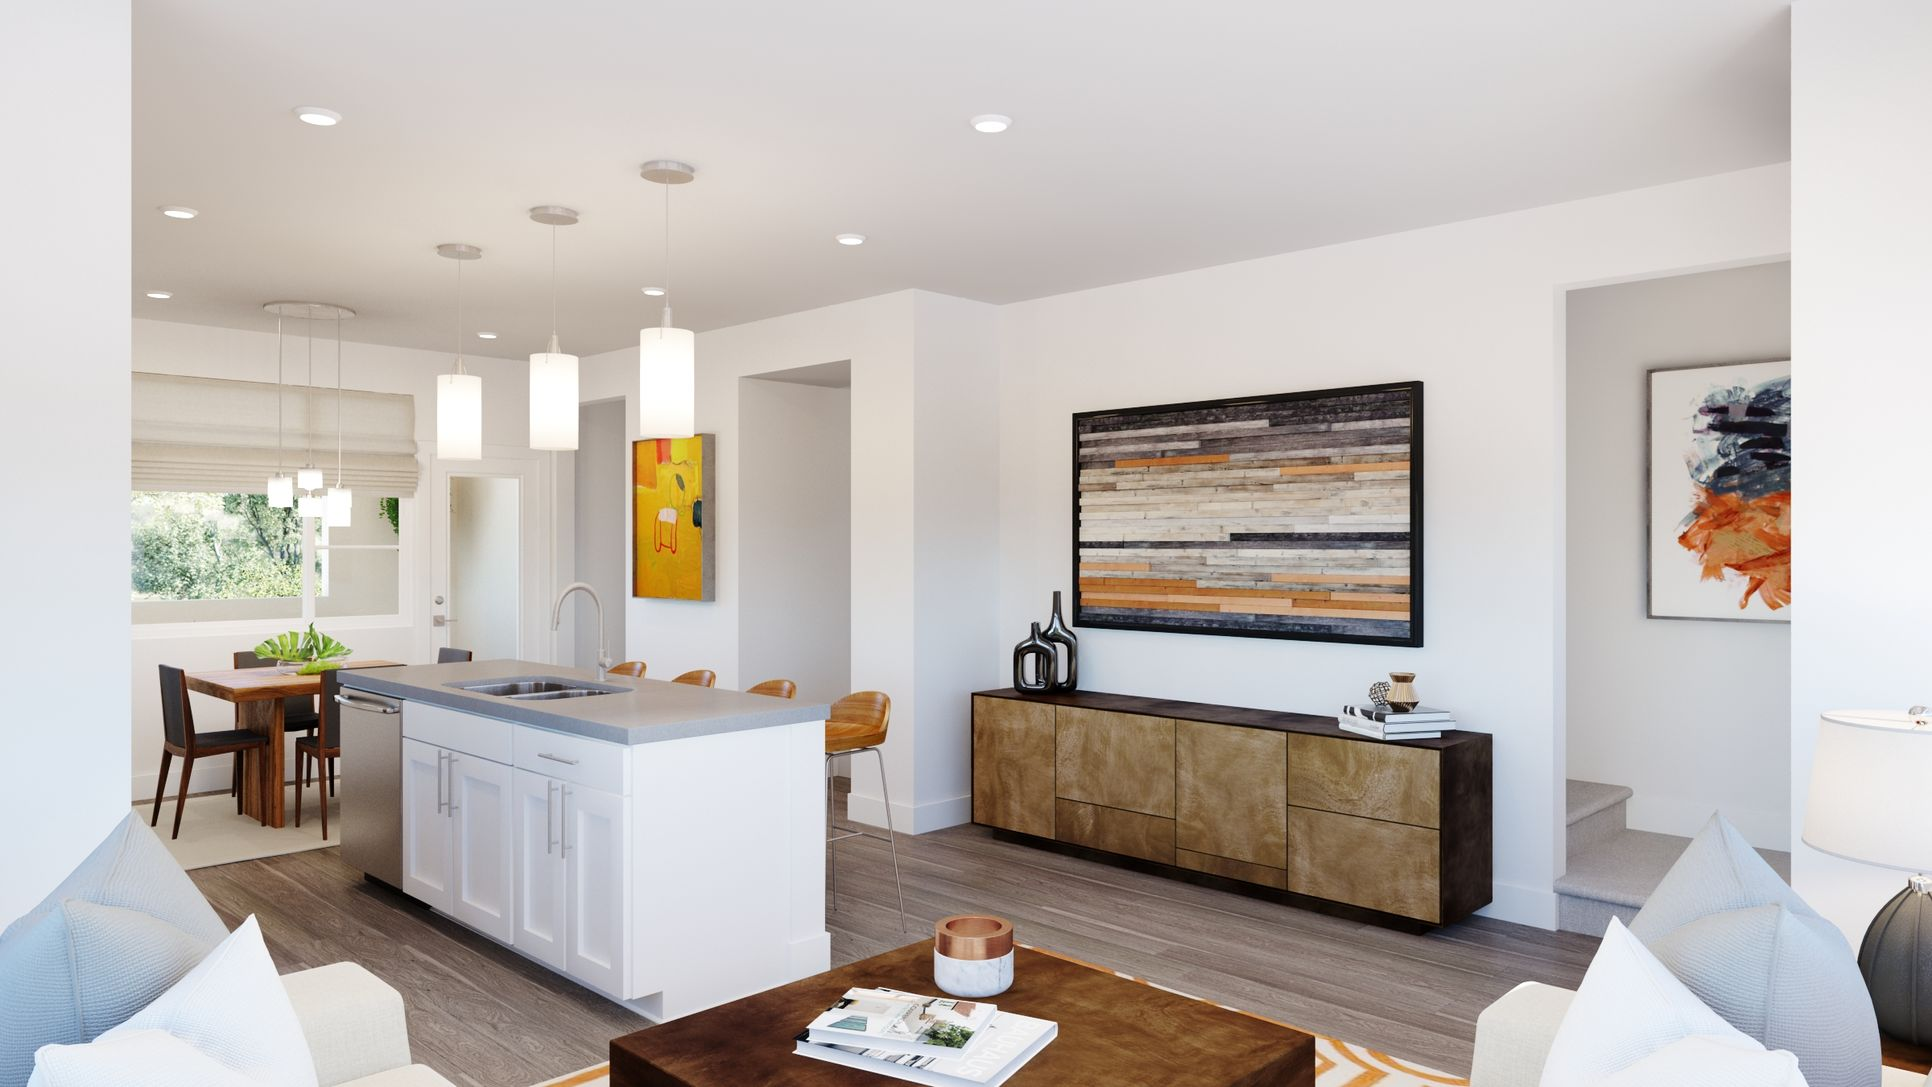 Volara Plan 2 Kitchen/Living:Volara Plan 2 Kitchen/Living